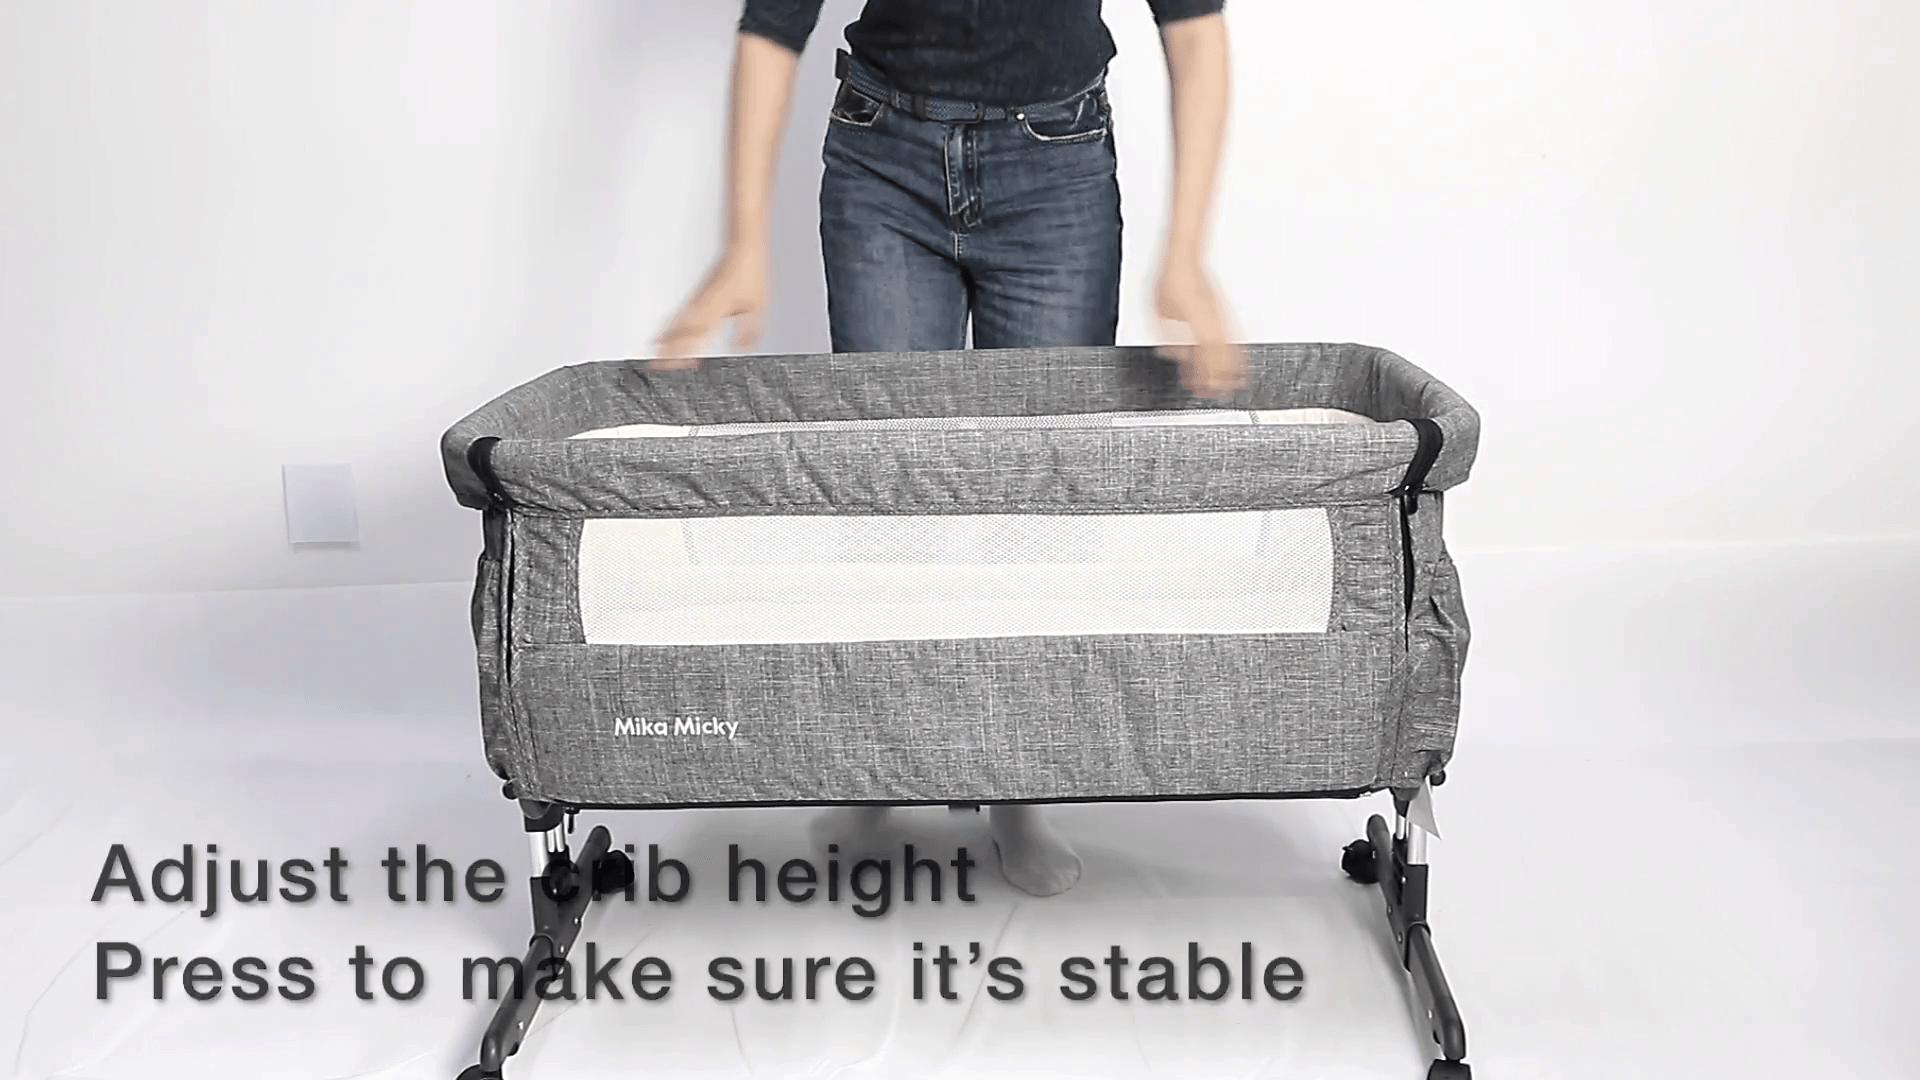 Mika Micky - adjust the height 4